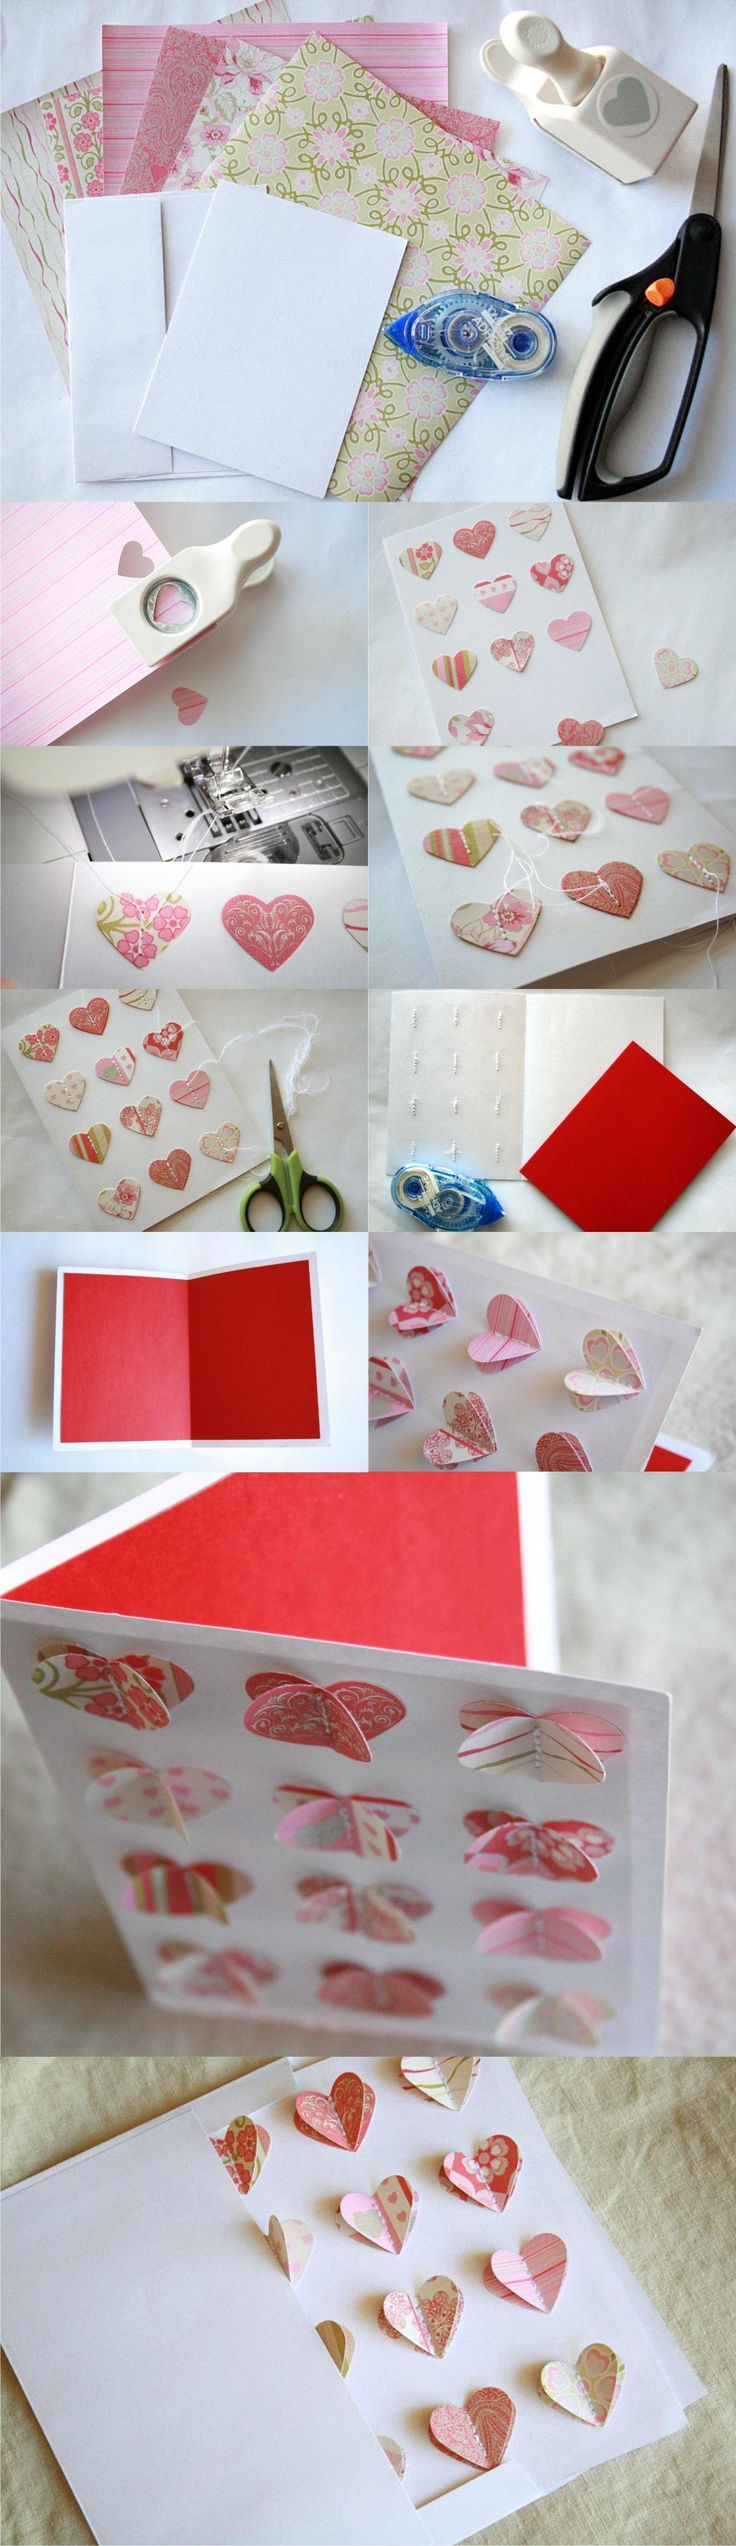 Postal DIY para San Valentín - thecreativeplace.blogspot.com -DIY 3D Heart Valentine Card